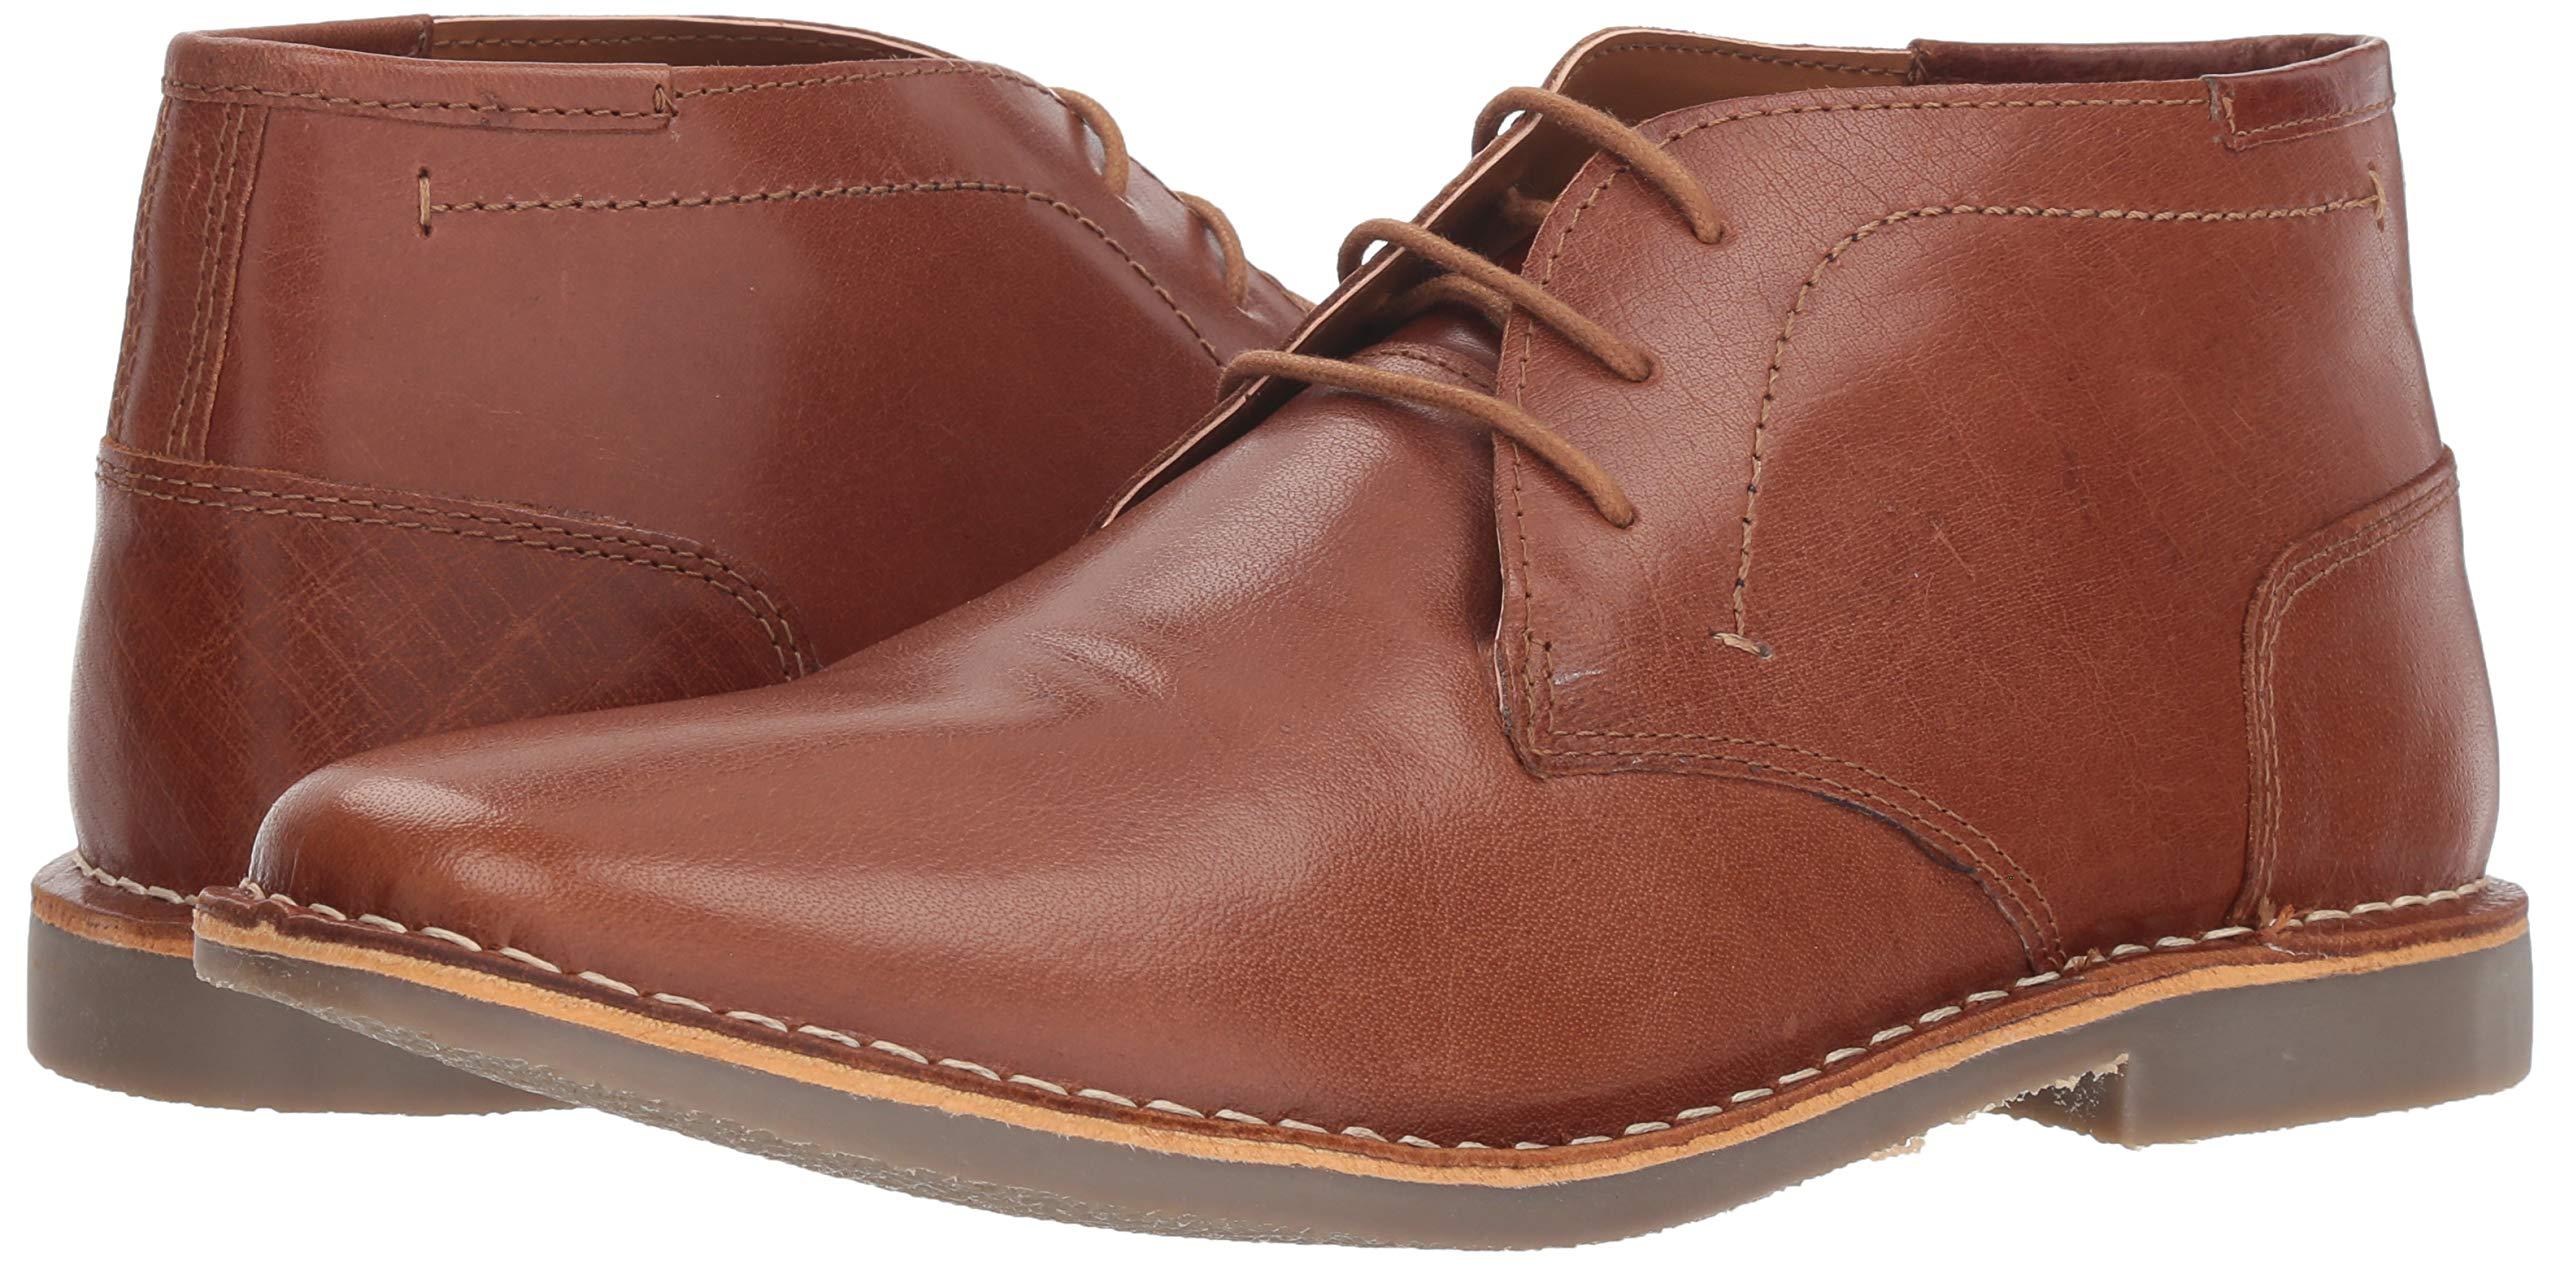 11ea5cf0e39 Details about Steve Madden Men's Harken Chukka Boot, Black, 7 M - Choose  SZ/color